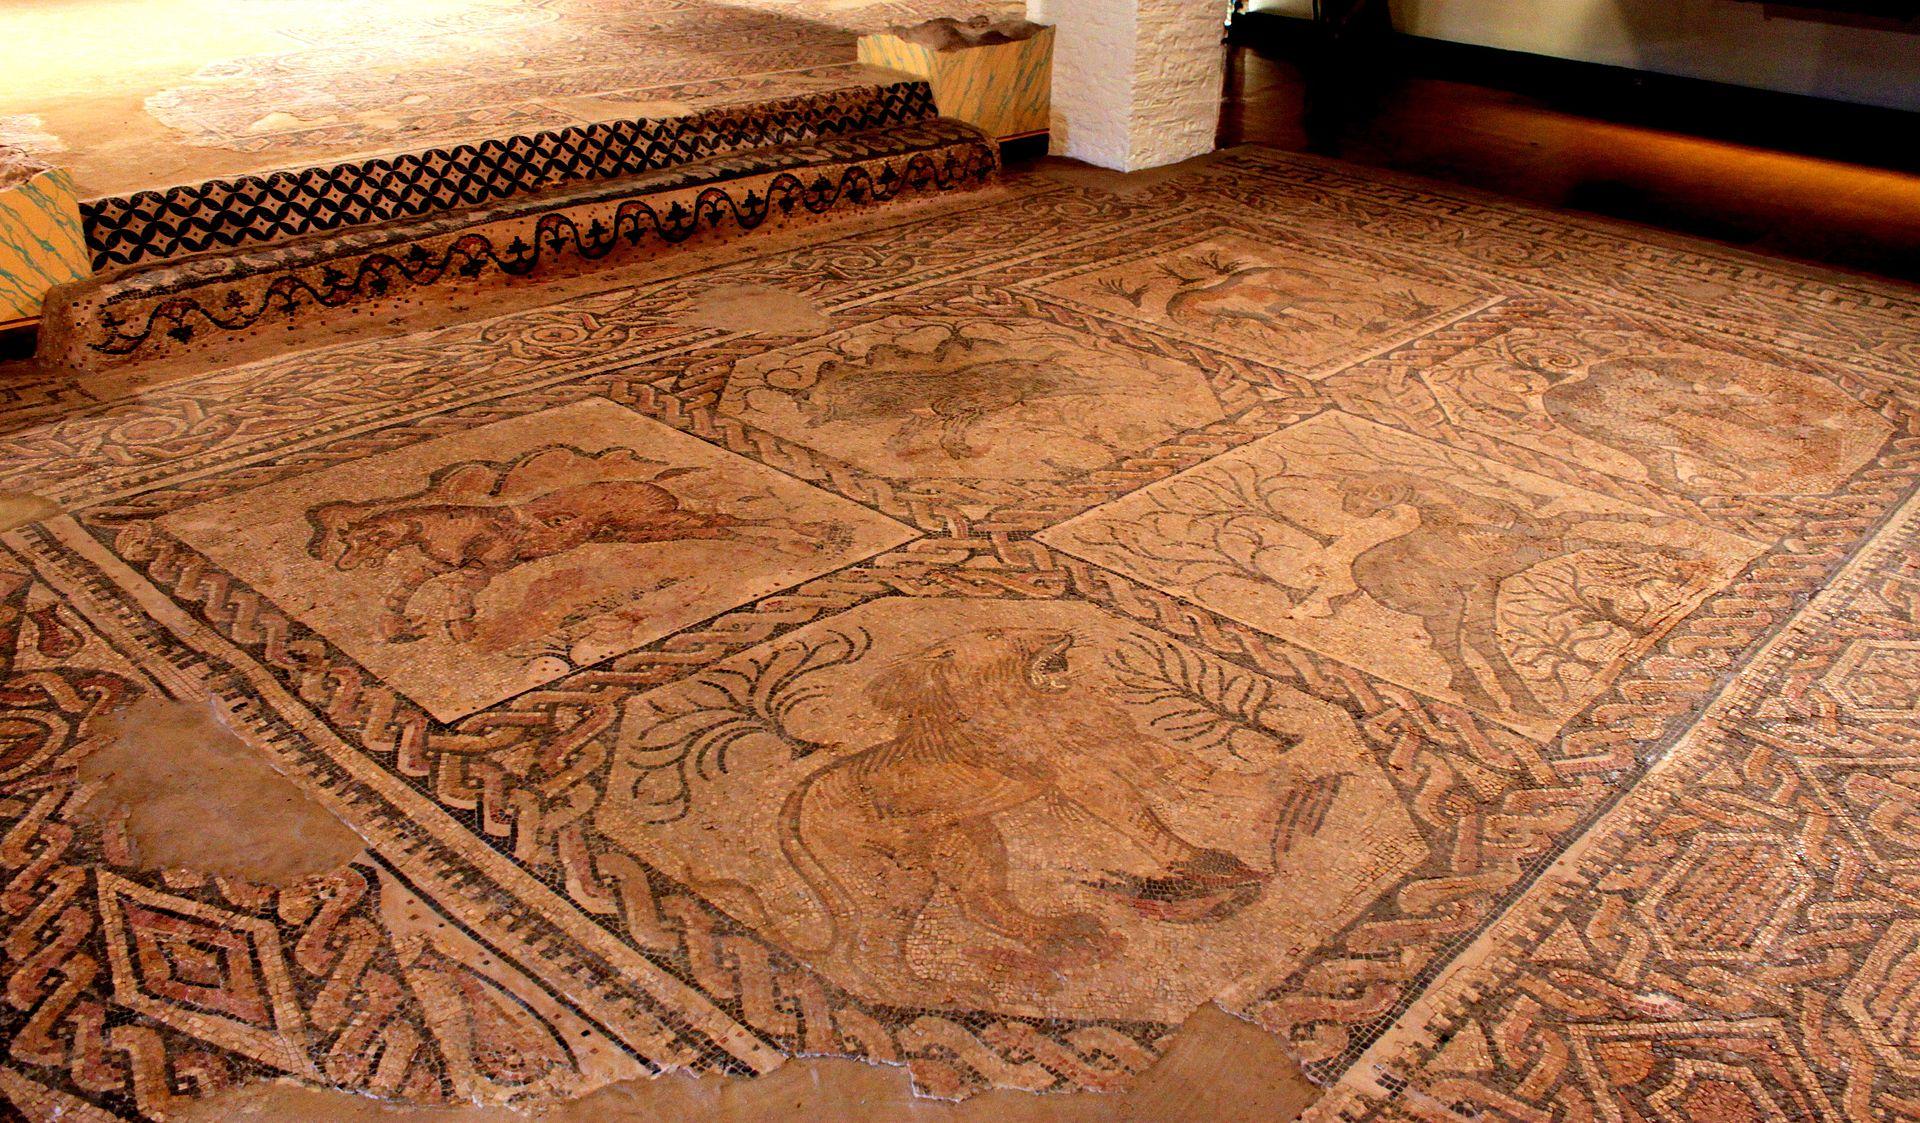 mosaico romano wikipedia la enciclopedia libre On mosaicos romanos faciles